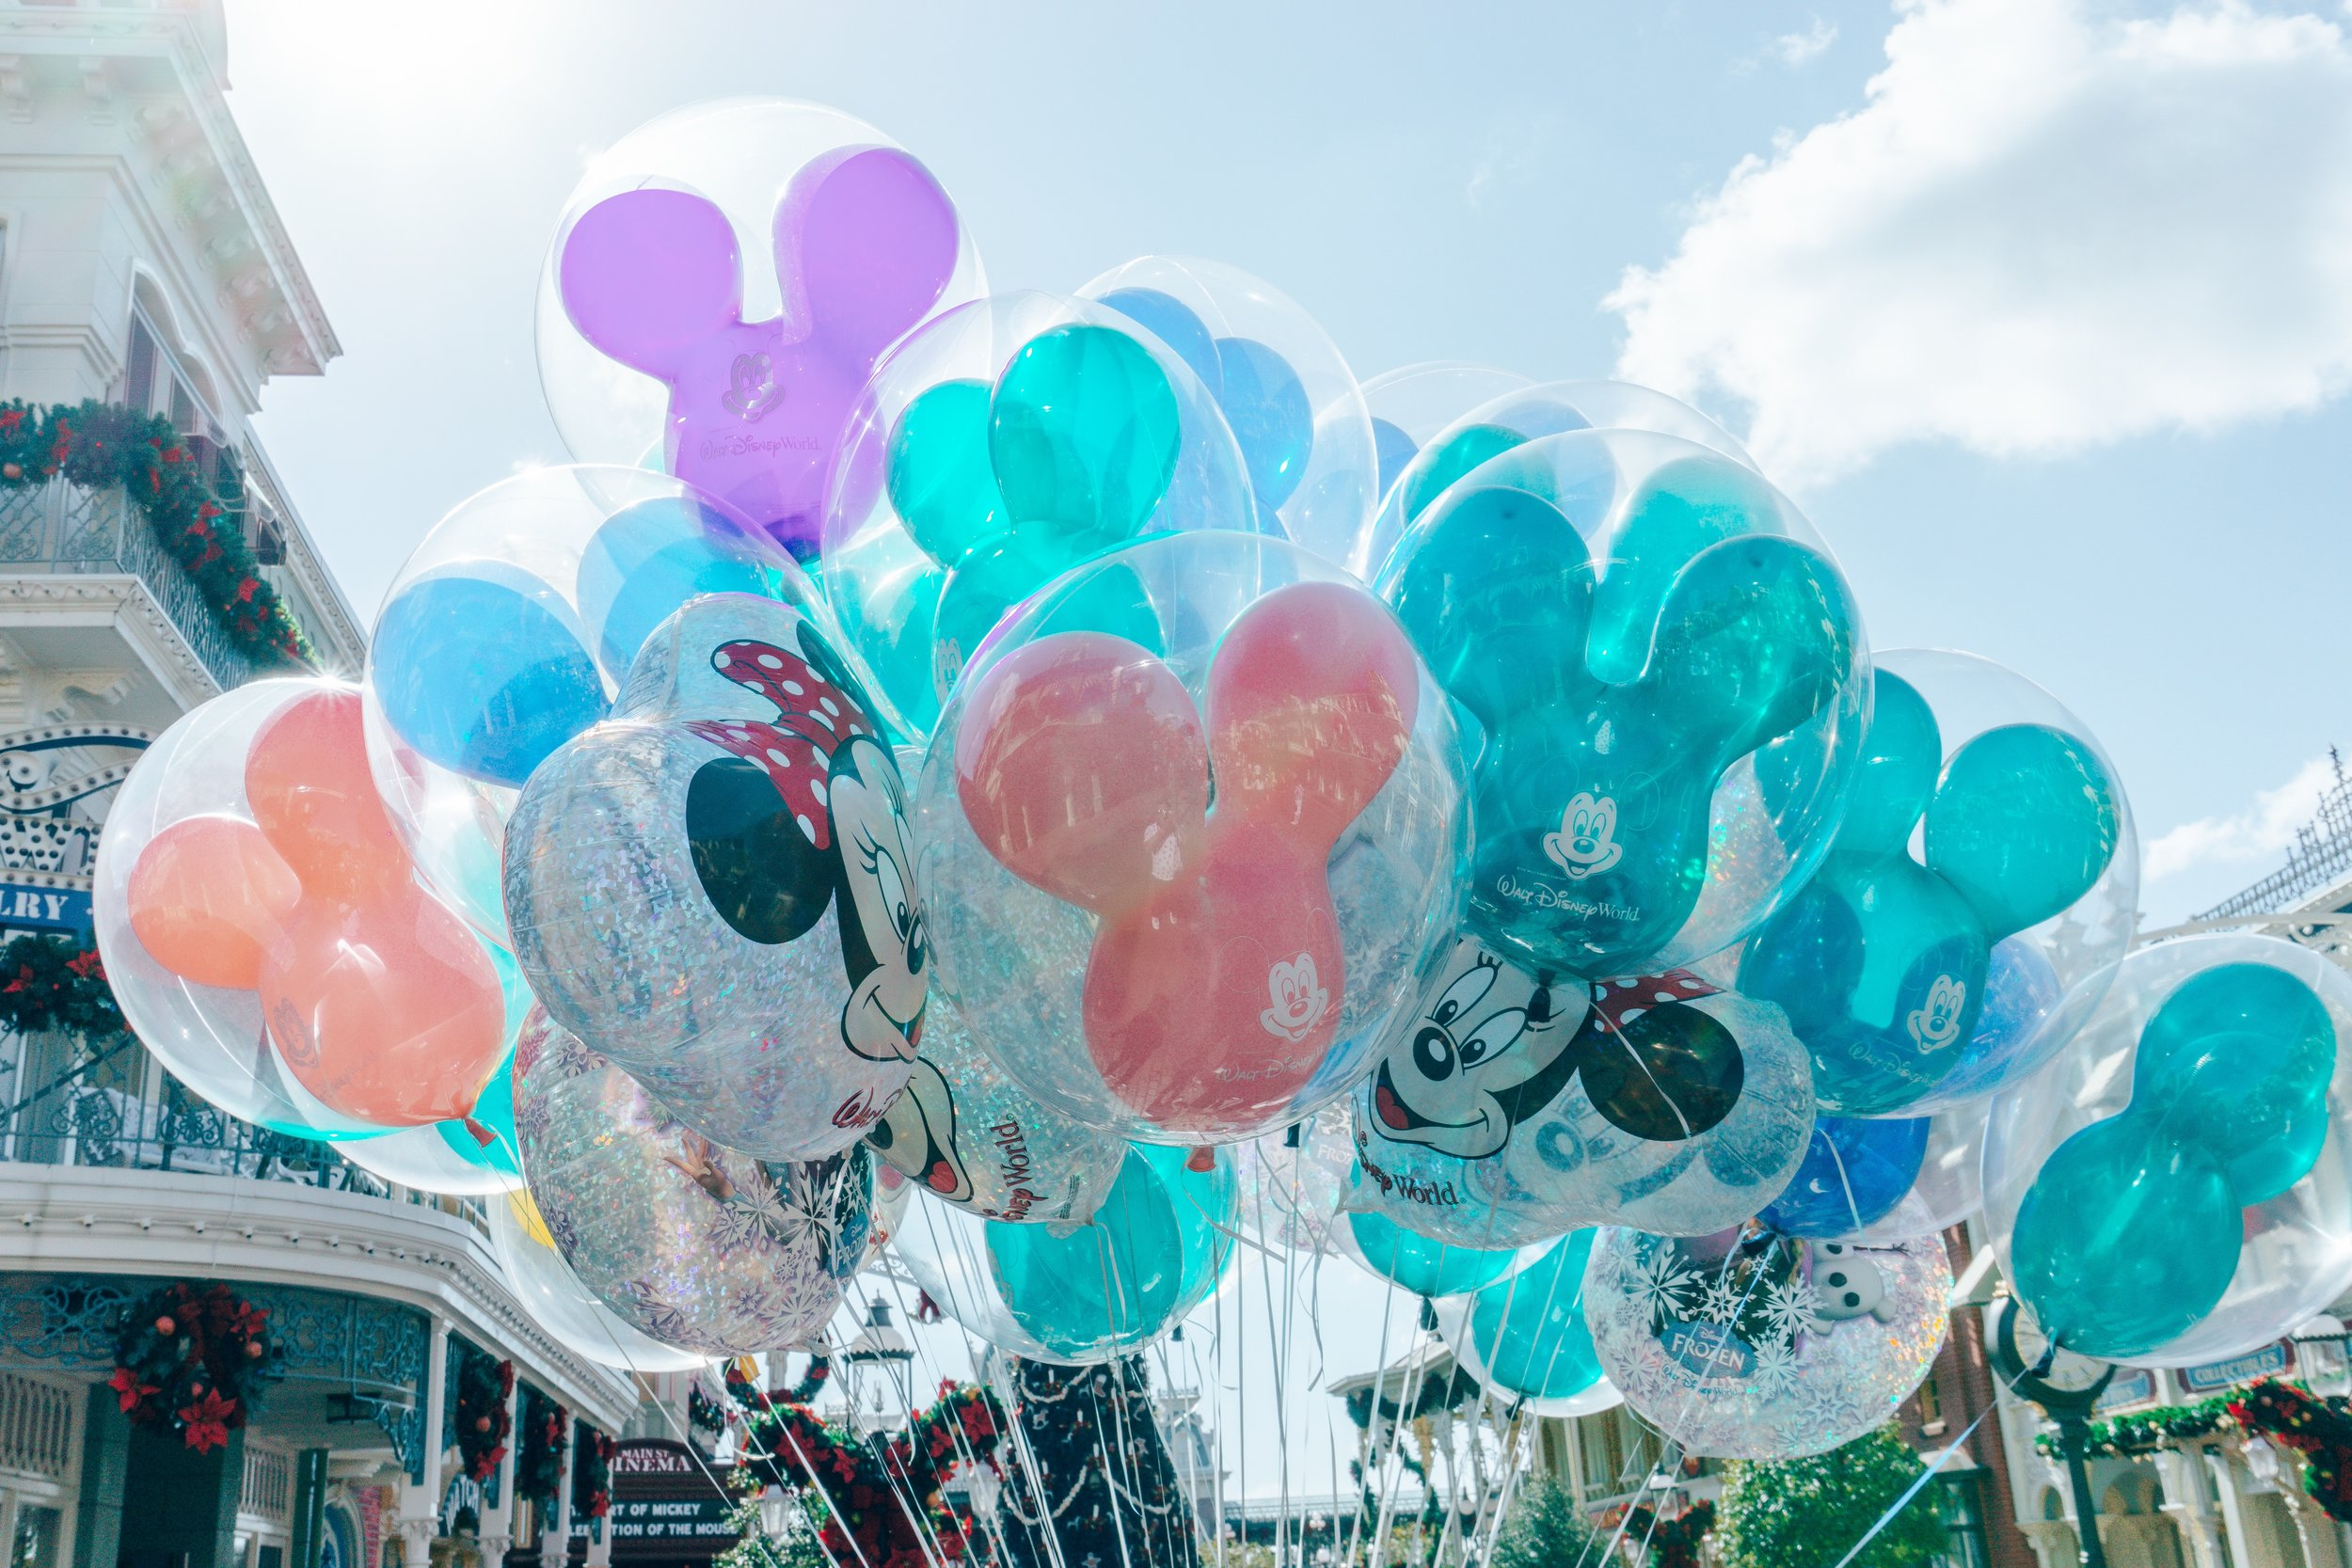 disneyballoons.jpeg